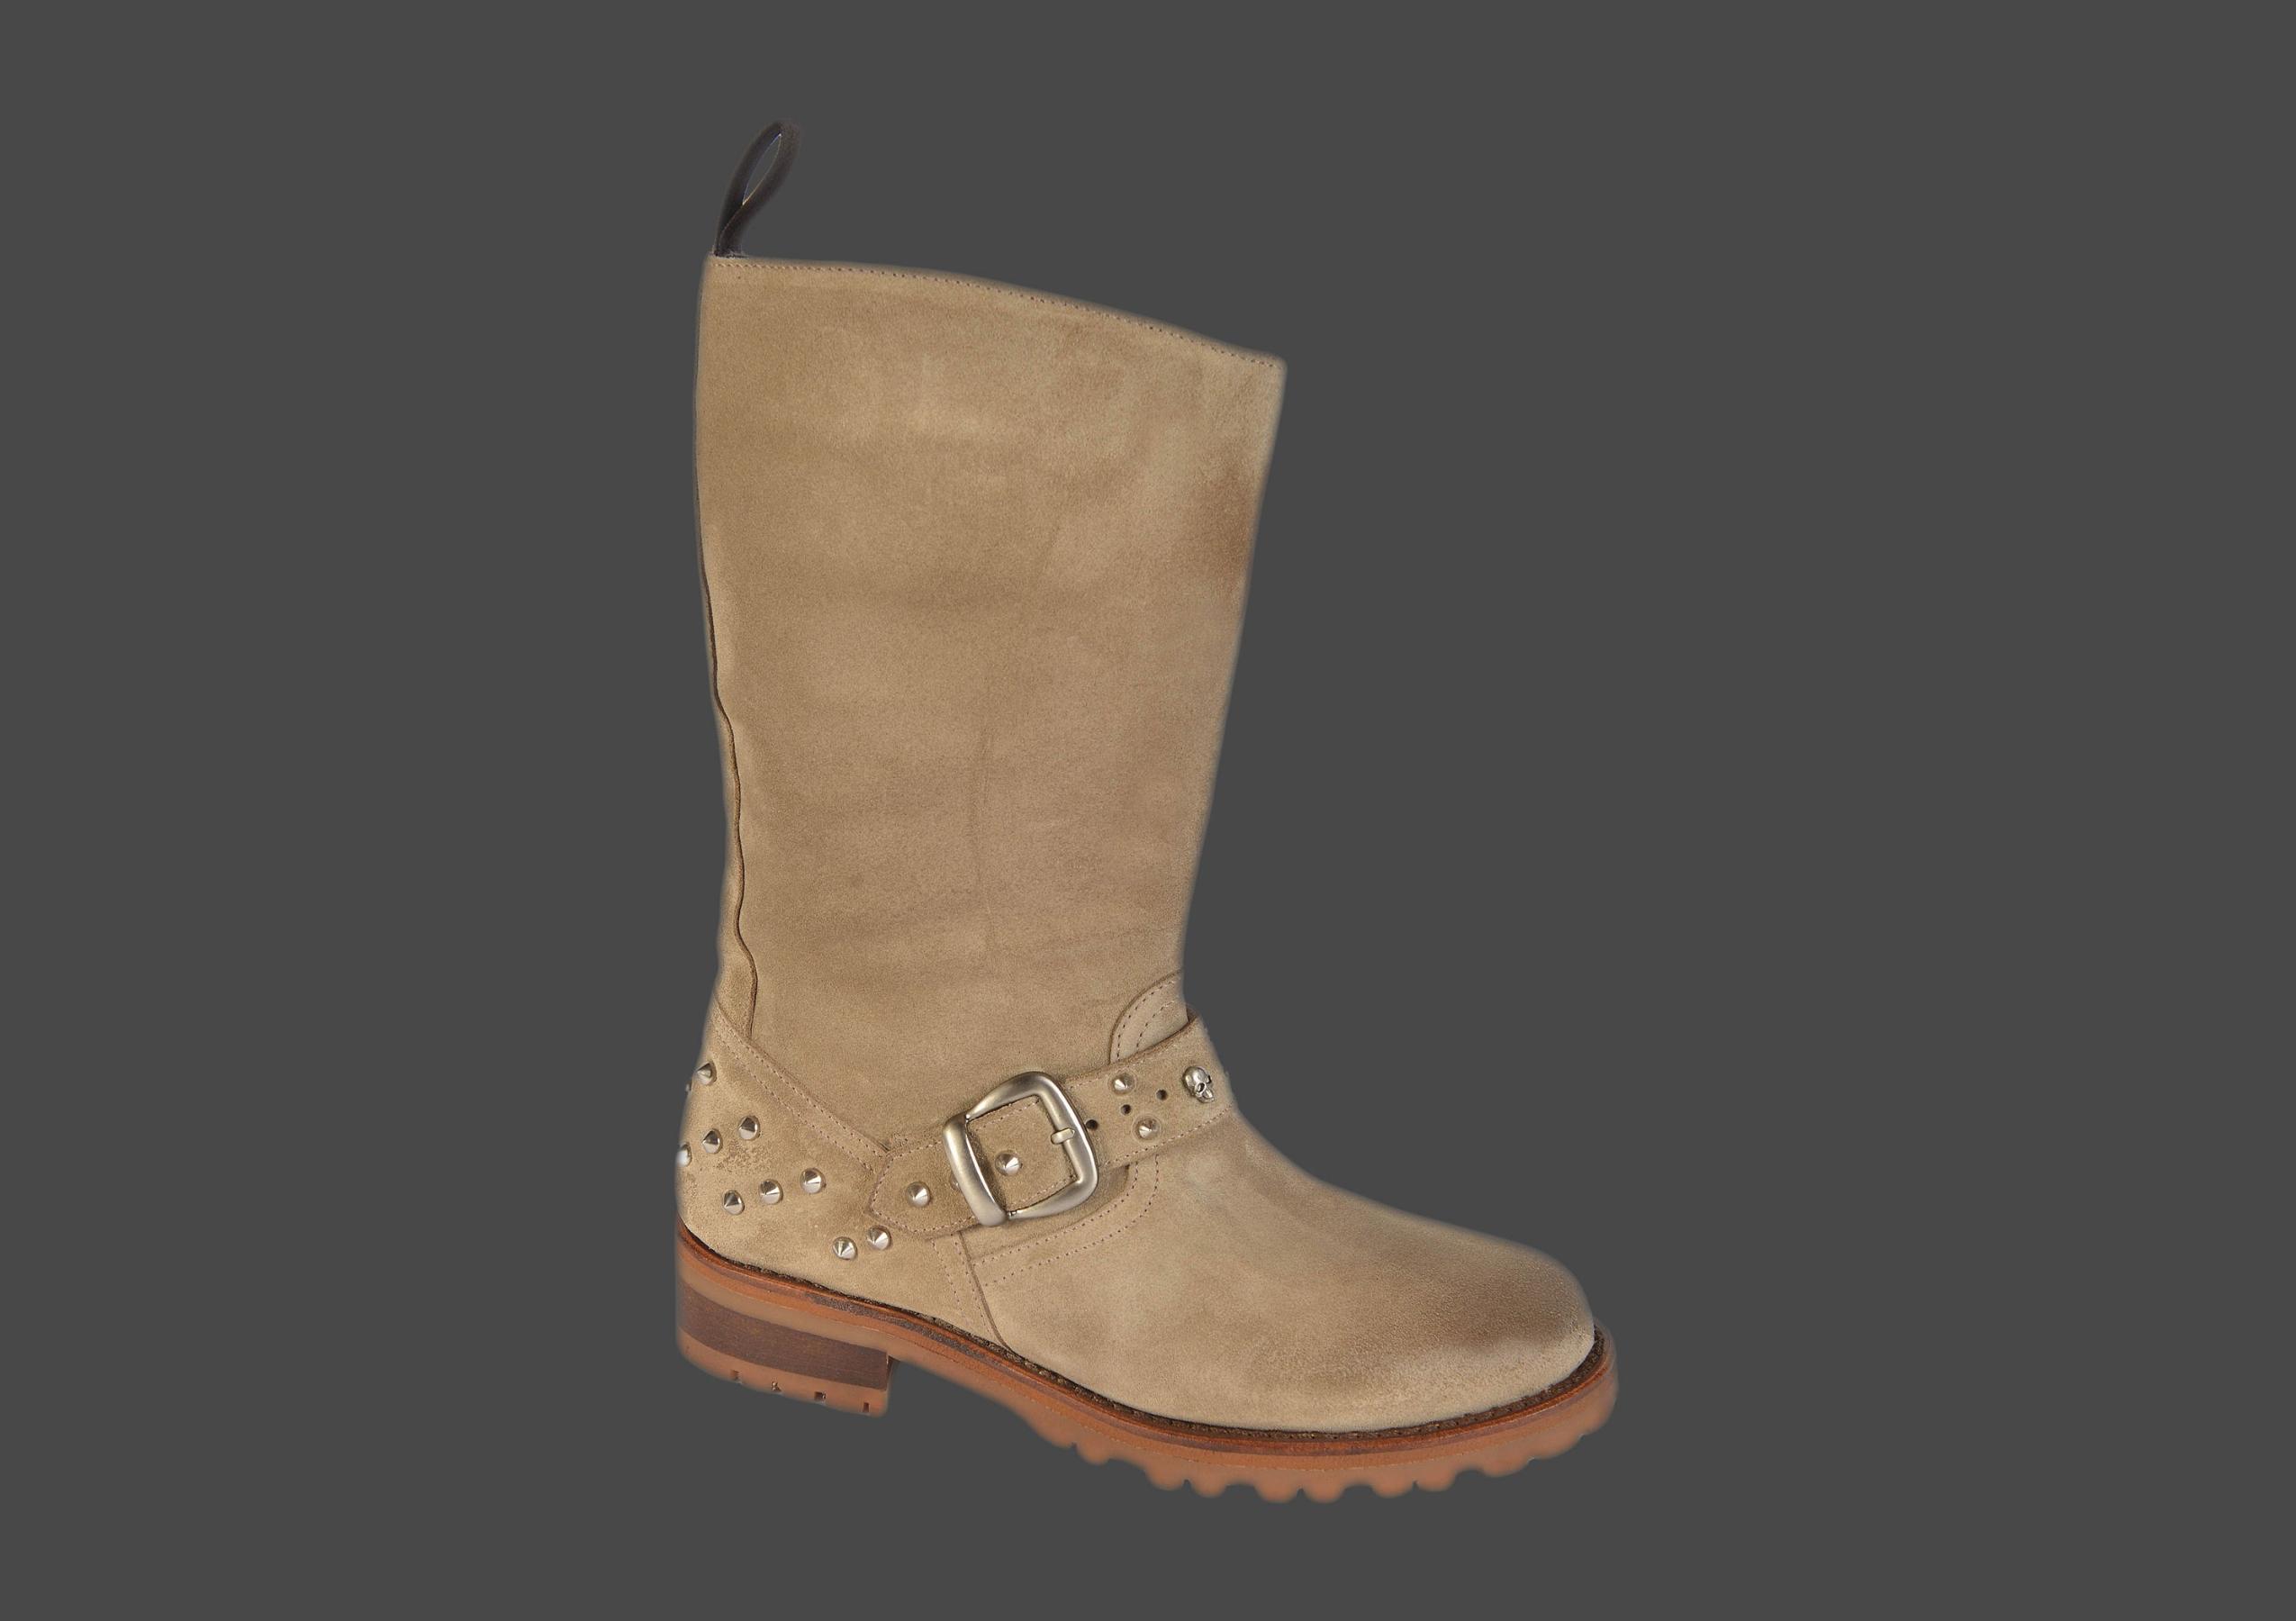 brooke rock femme daim beige < bottines rock femme < chaussures